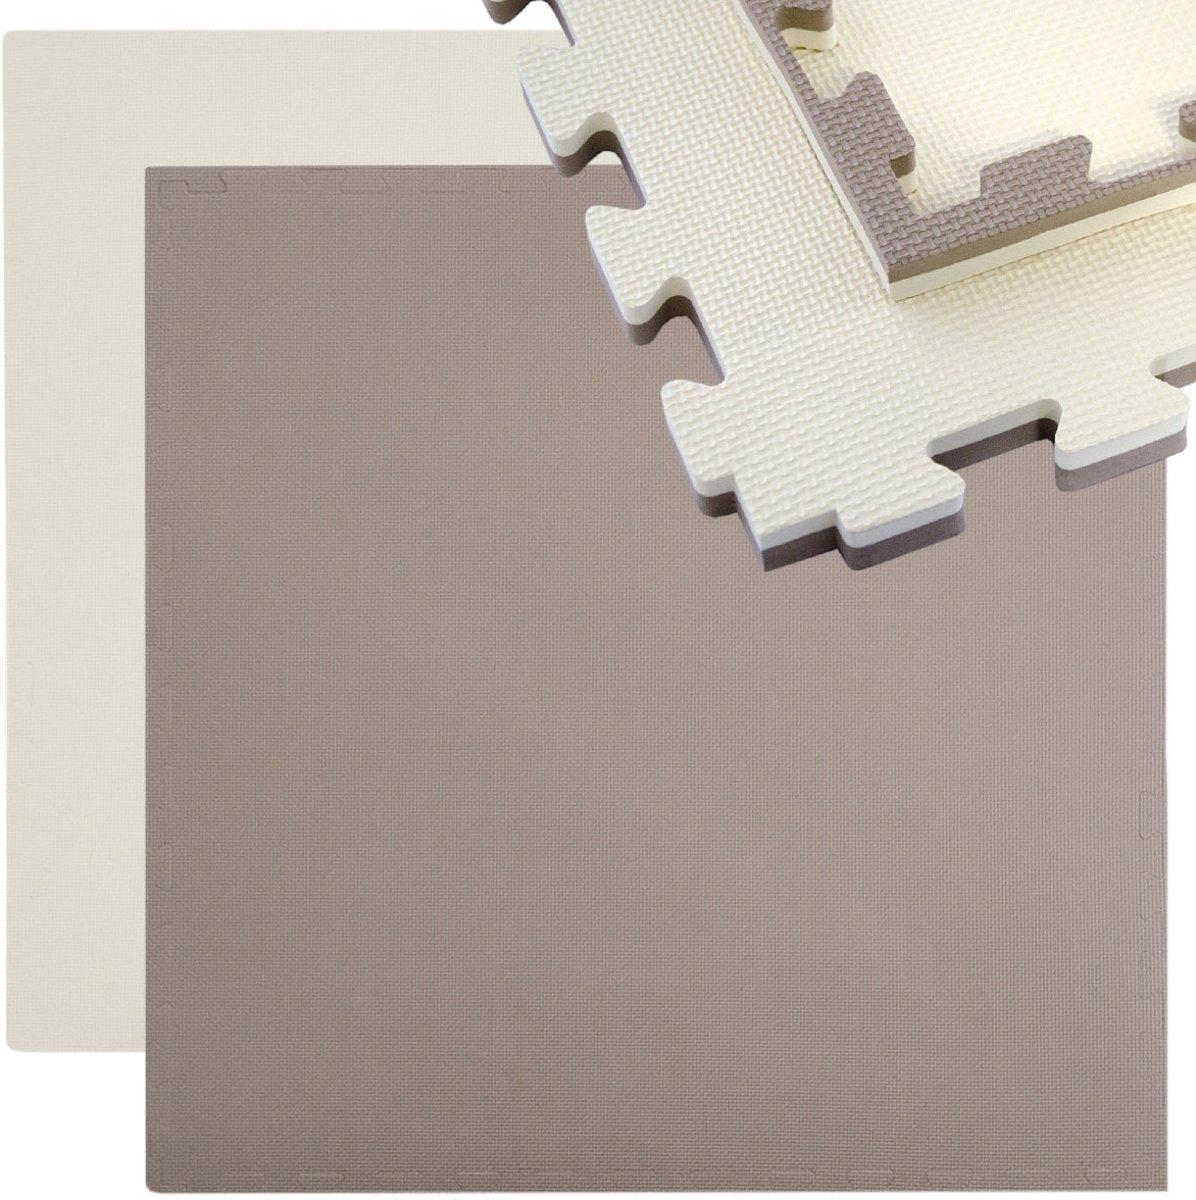 Sportmat 90x90cm 25mm dik Puzzelmat Omkeerbare vloermat uittrekbaar incl. rand